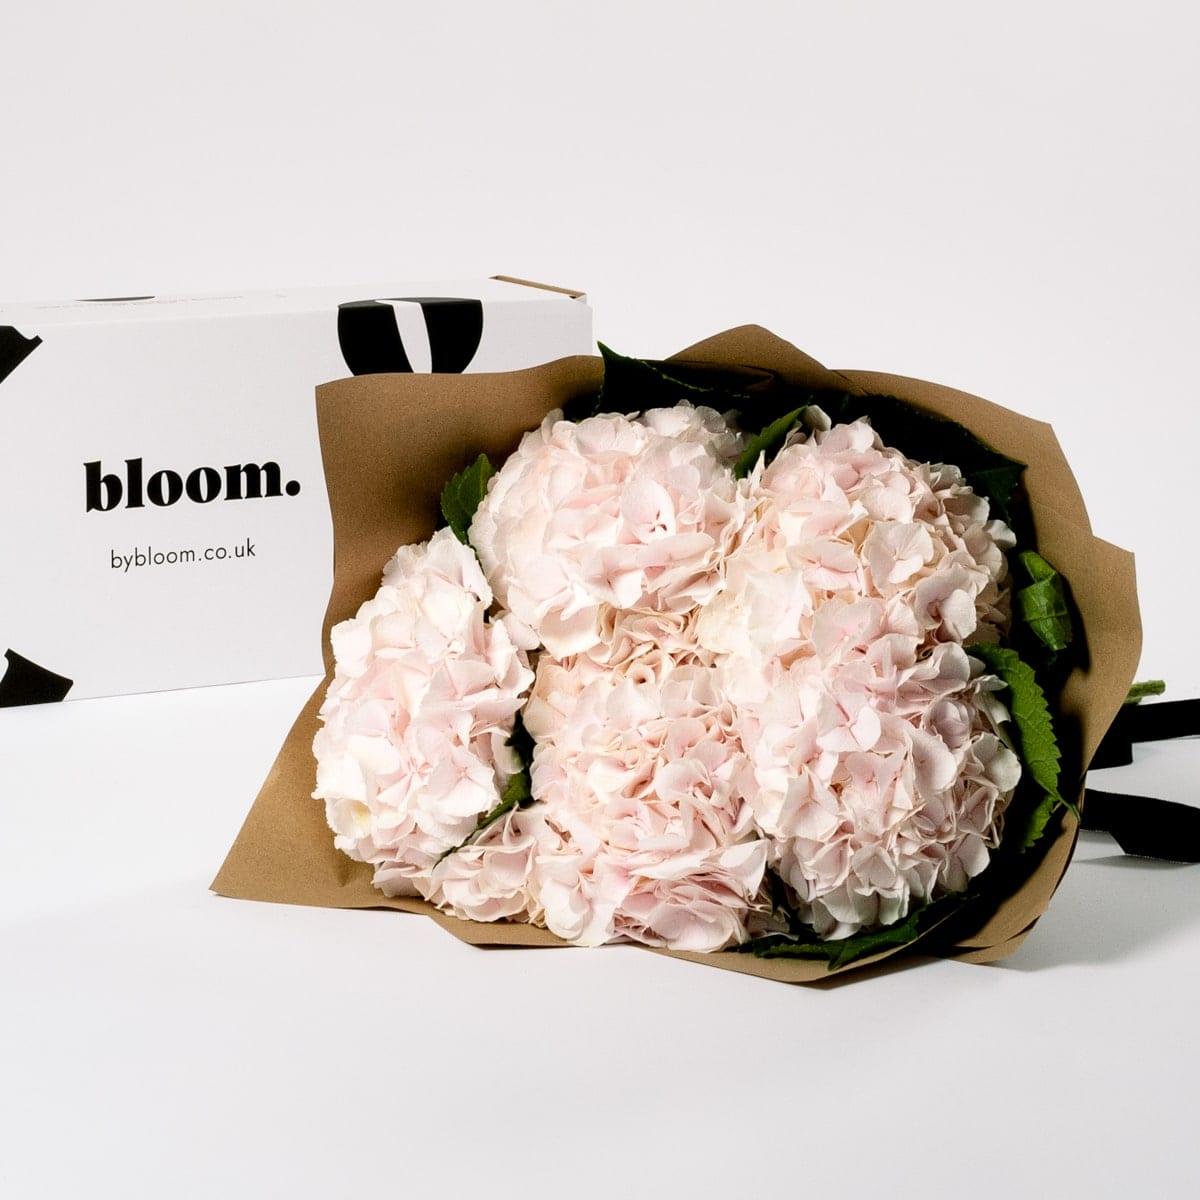 Bloom Flower Delivery   Ballet Slipper Pink Hydrangea